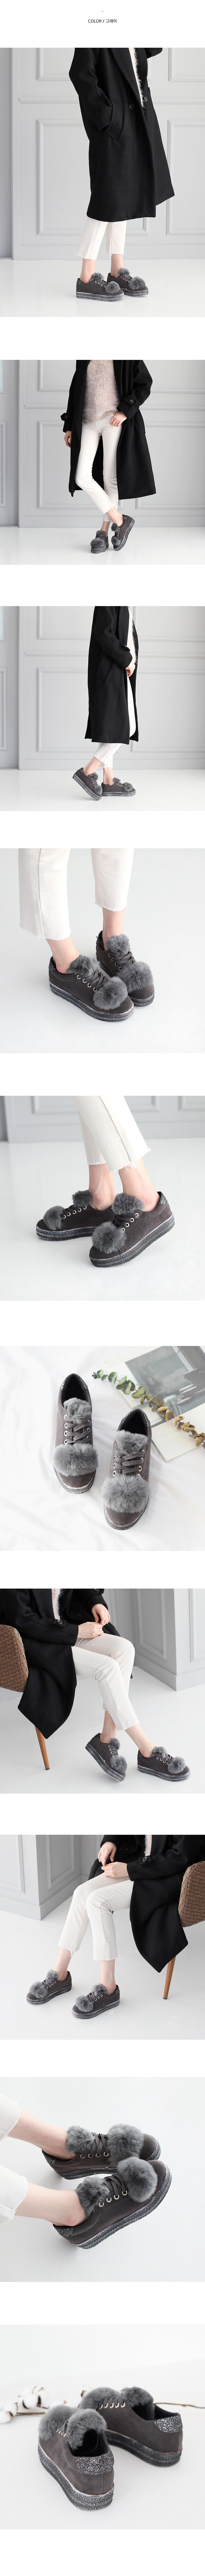 Illpour sneakers 3cm